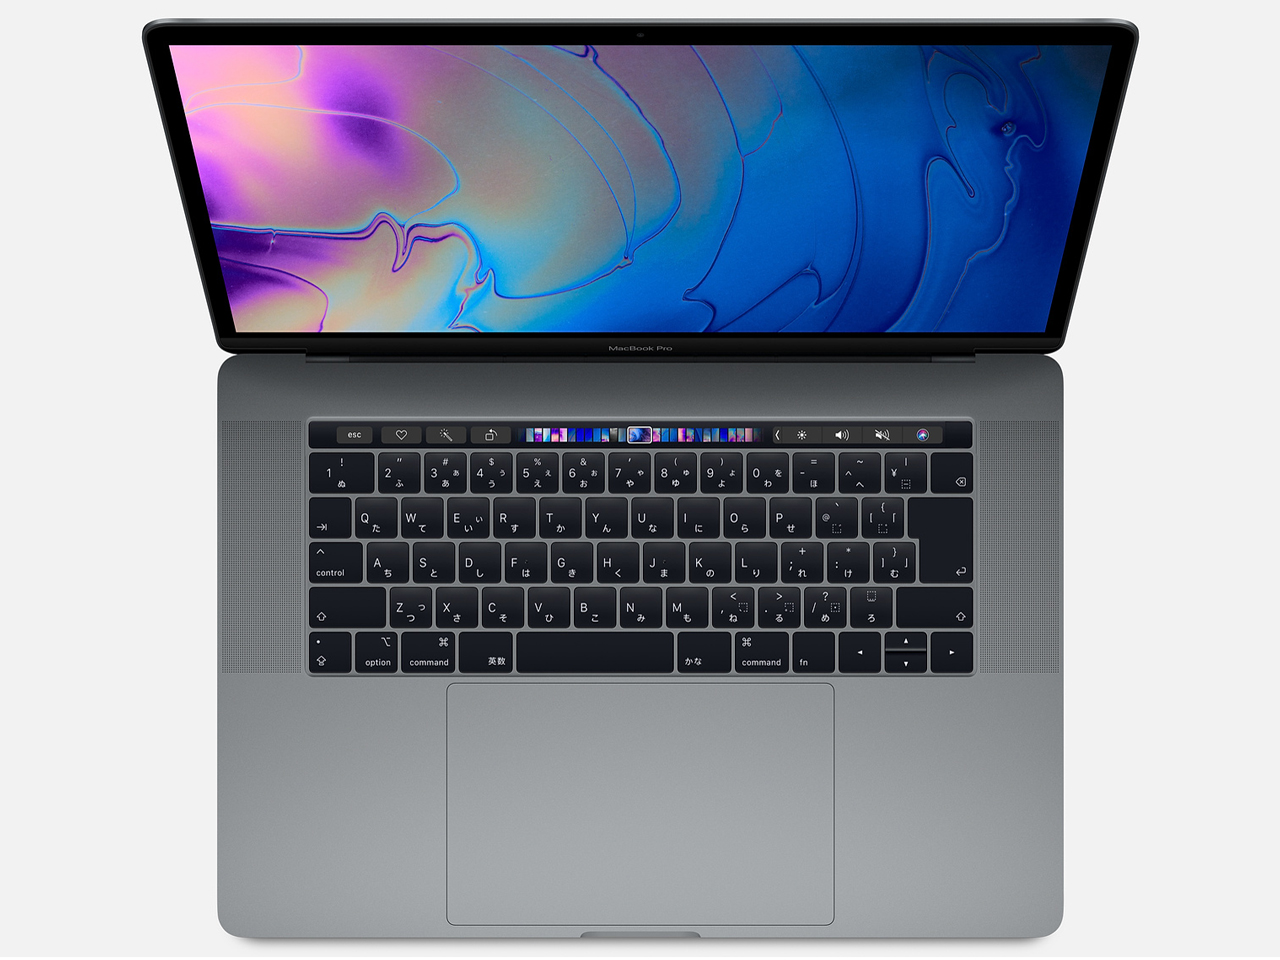 MacBook Pro Retinaディスプレイ 2300/15.4 MV912J/A [スペースグレイ]